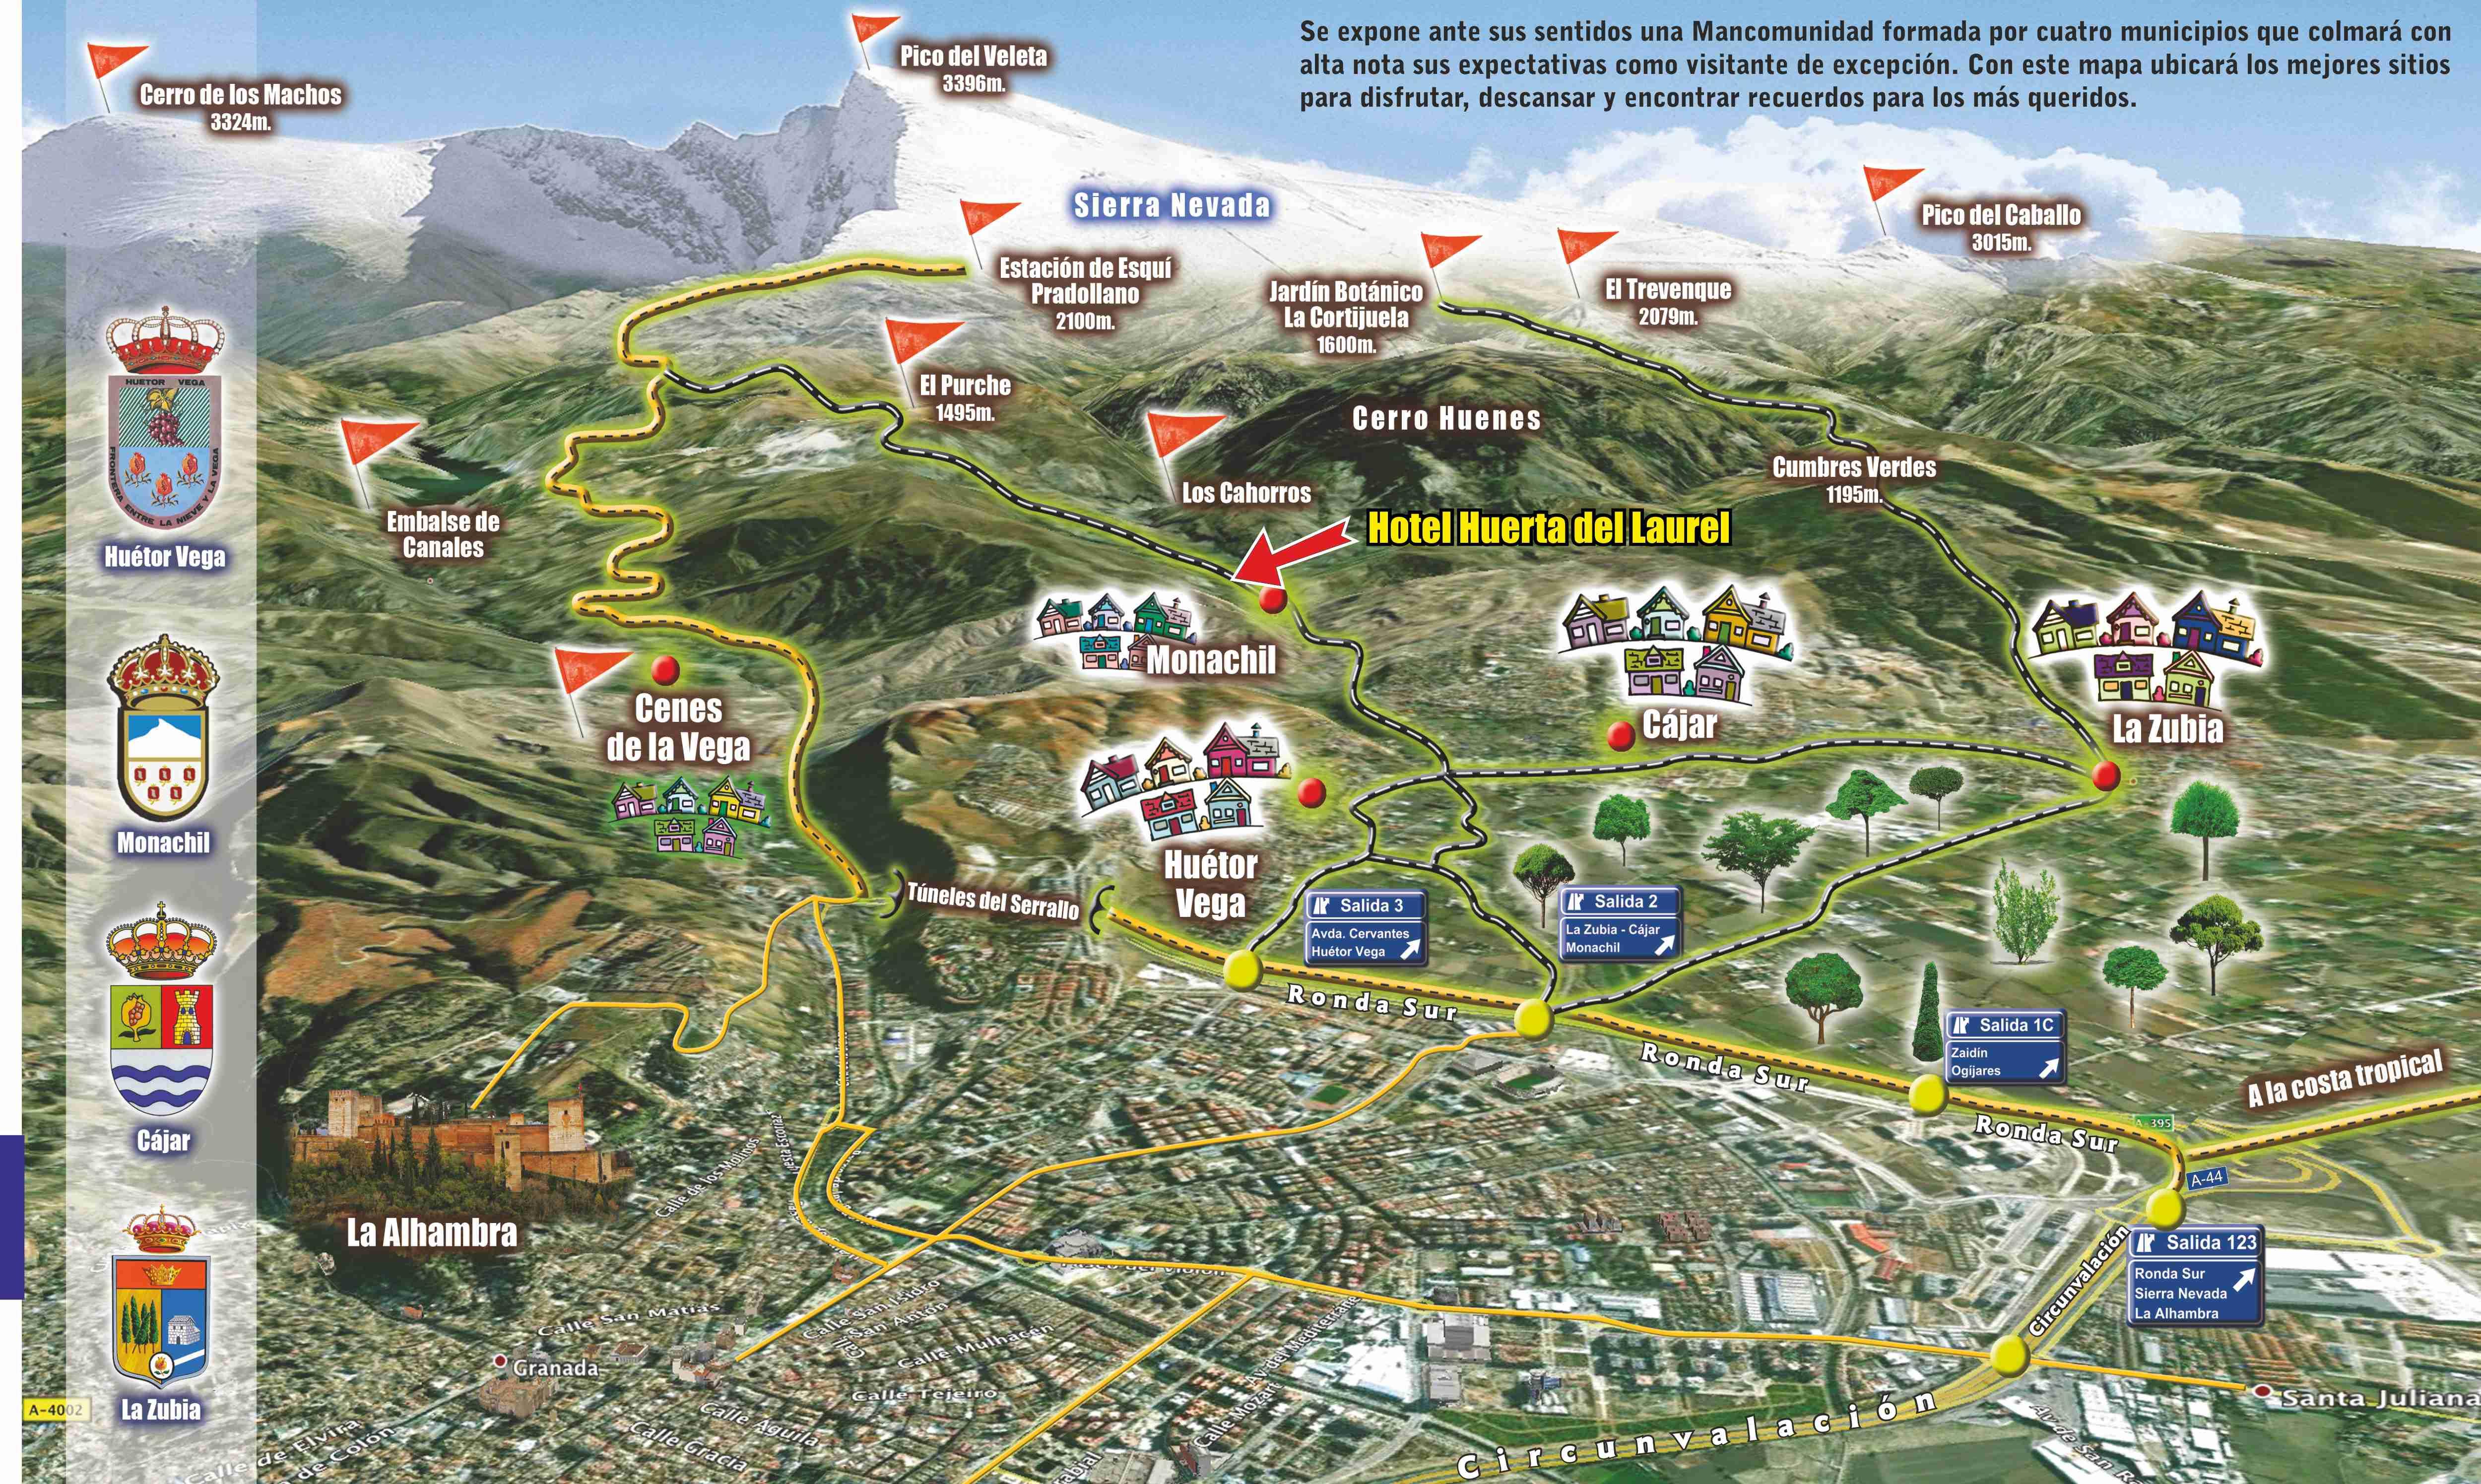 Los Cahorros Monachil Mapa.Hotel Rural Huerta Del Laurel Monachil Granada Sierra Nevada